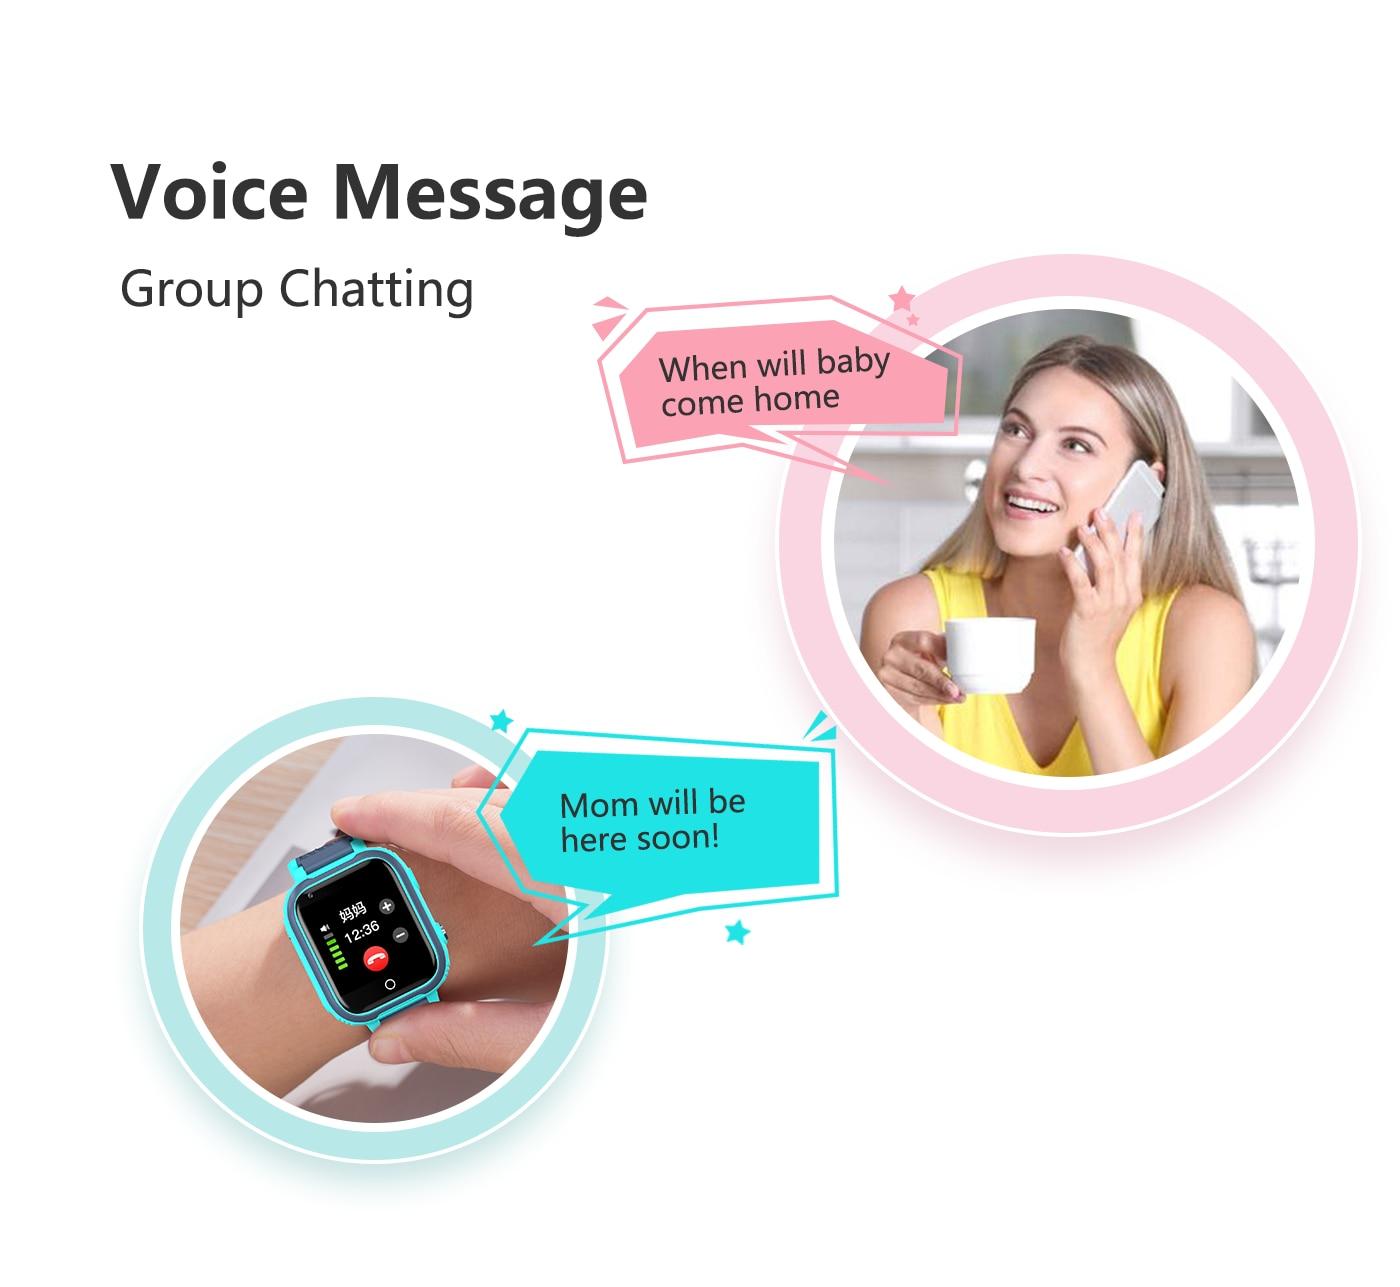 Hd1cf69d08a4d4e95ac8af6024998acc5P LT21 4G Smart Watch Kids GPS WIFI Video Call SOS IP67 Waterproof Child Smartwatch Camera Monitor Tracker Location Phone Watch